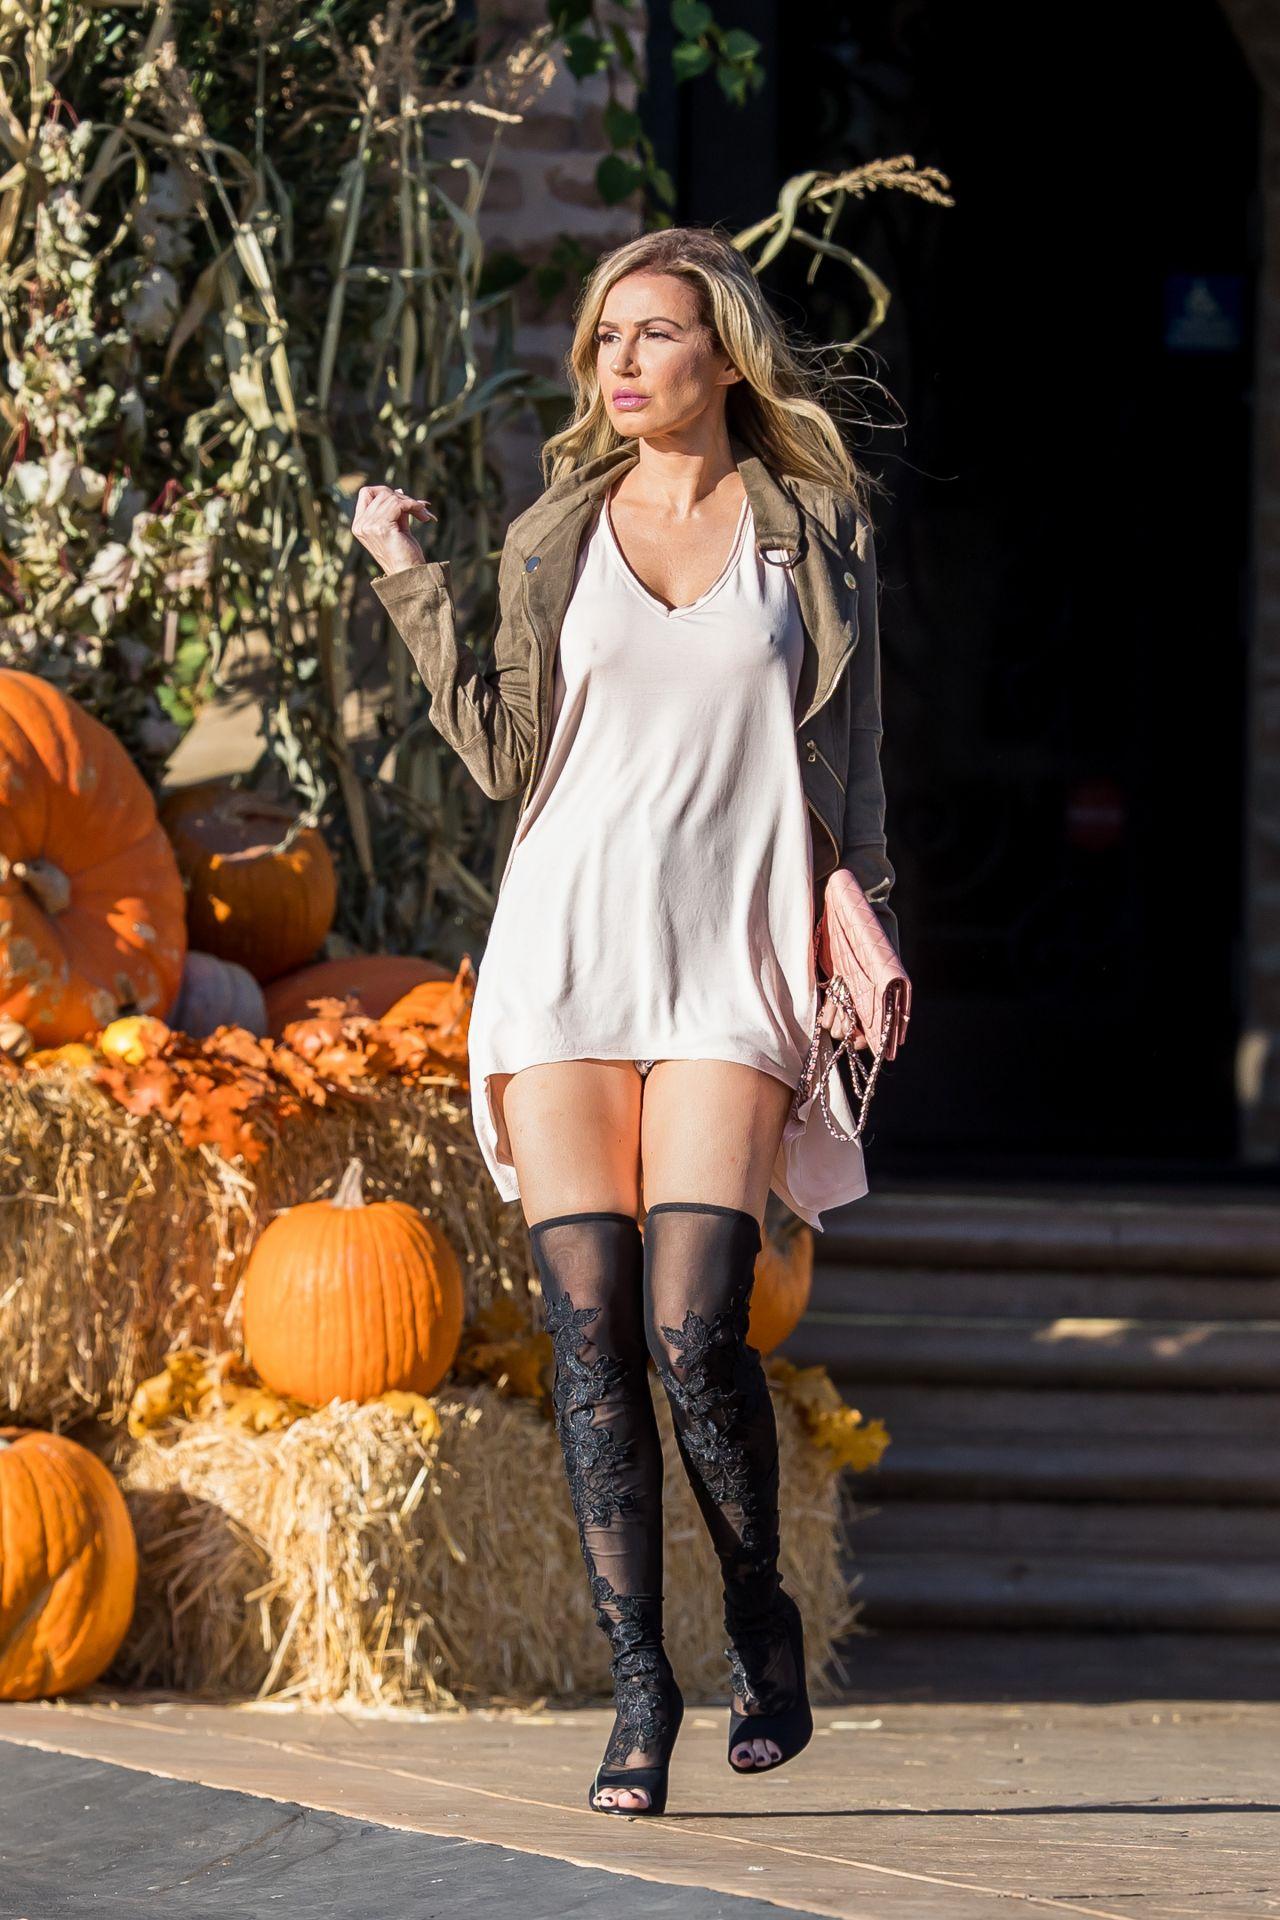 Ana Braga Hot Street Style - Los Angeles 10/14/2017